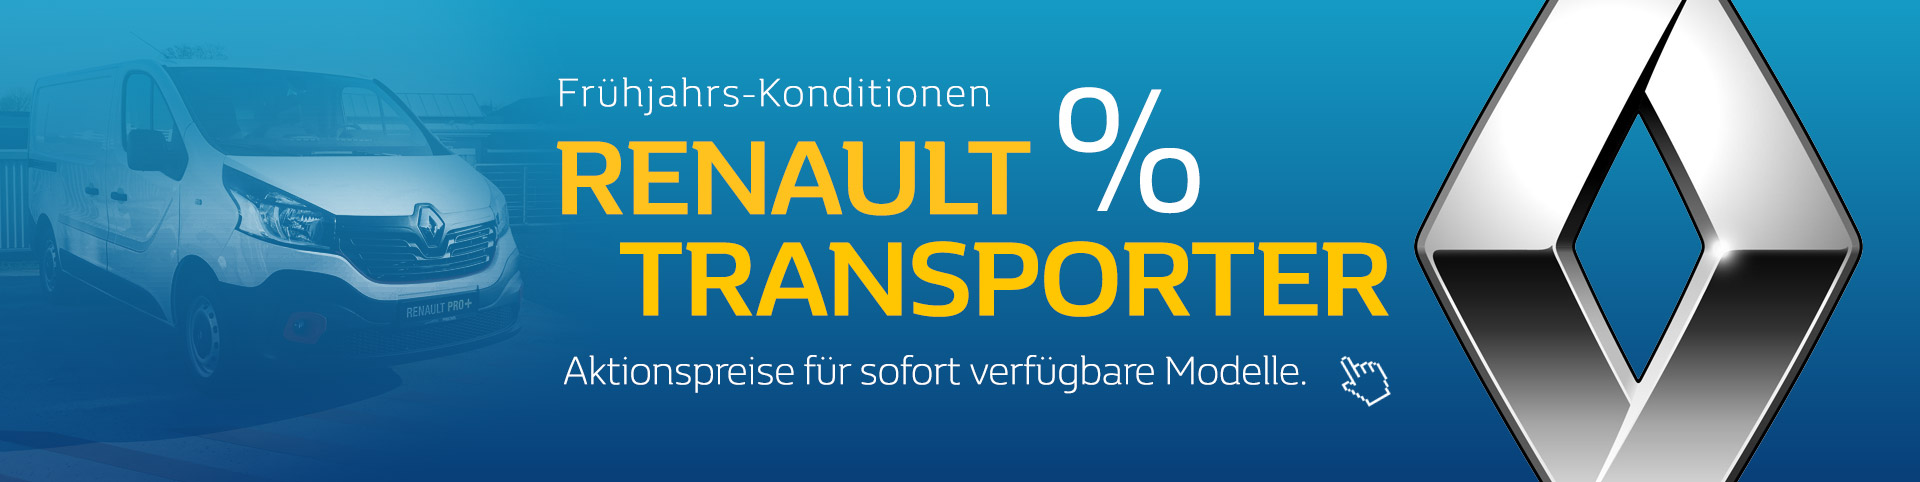 Renault Transporter Frühjahrskonditionen